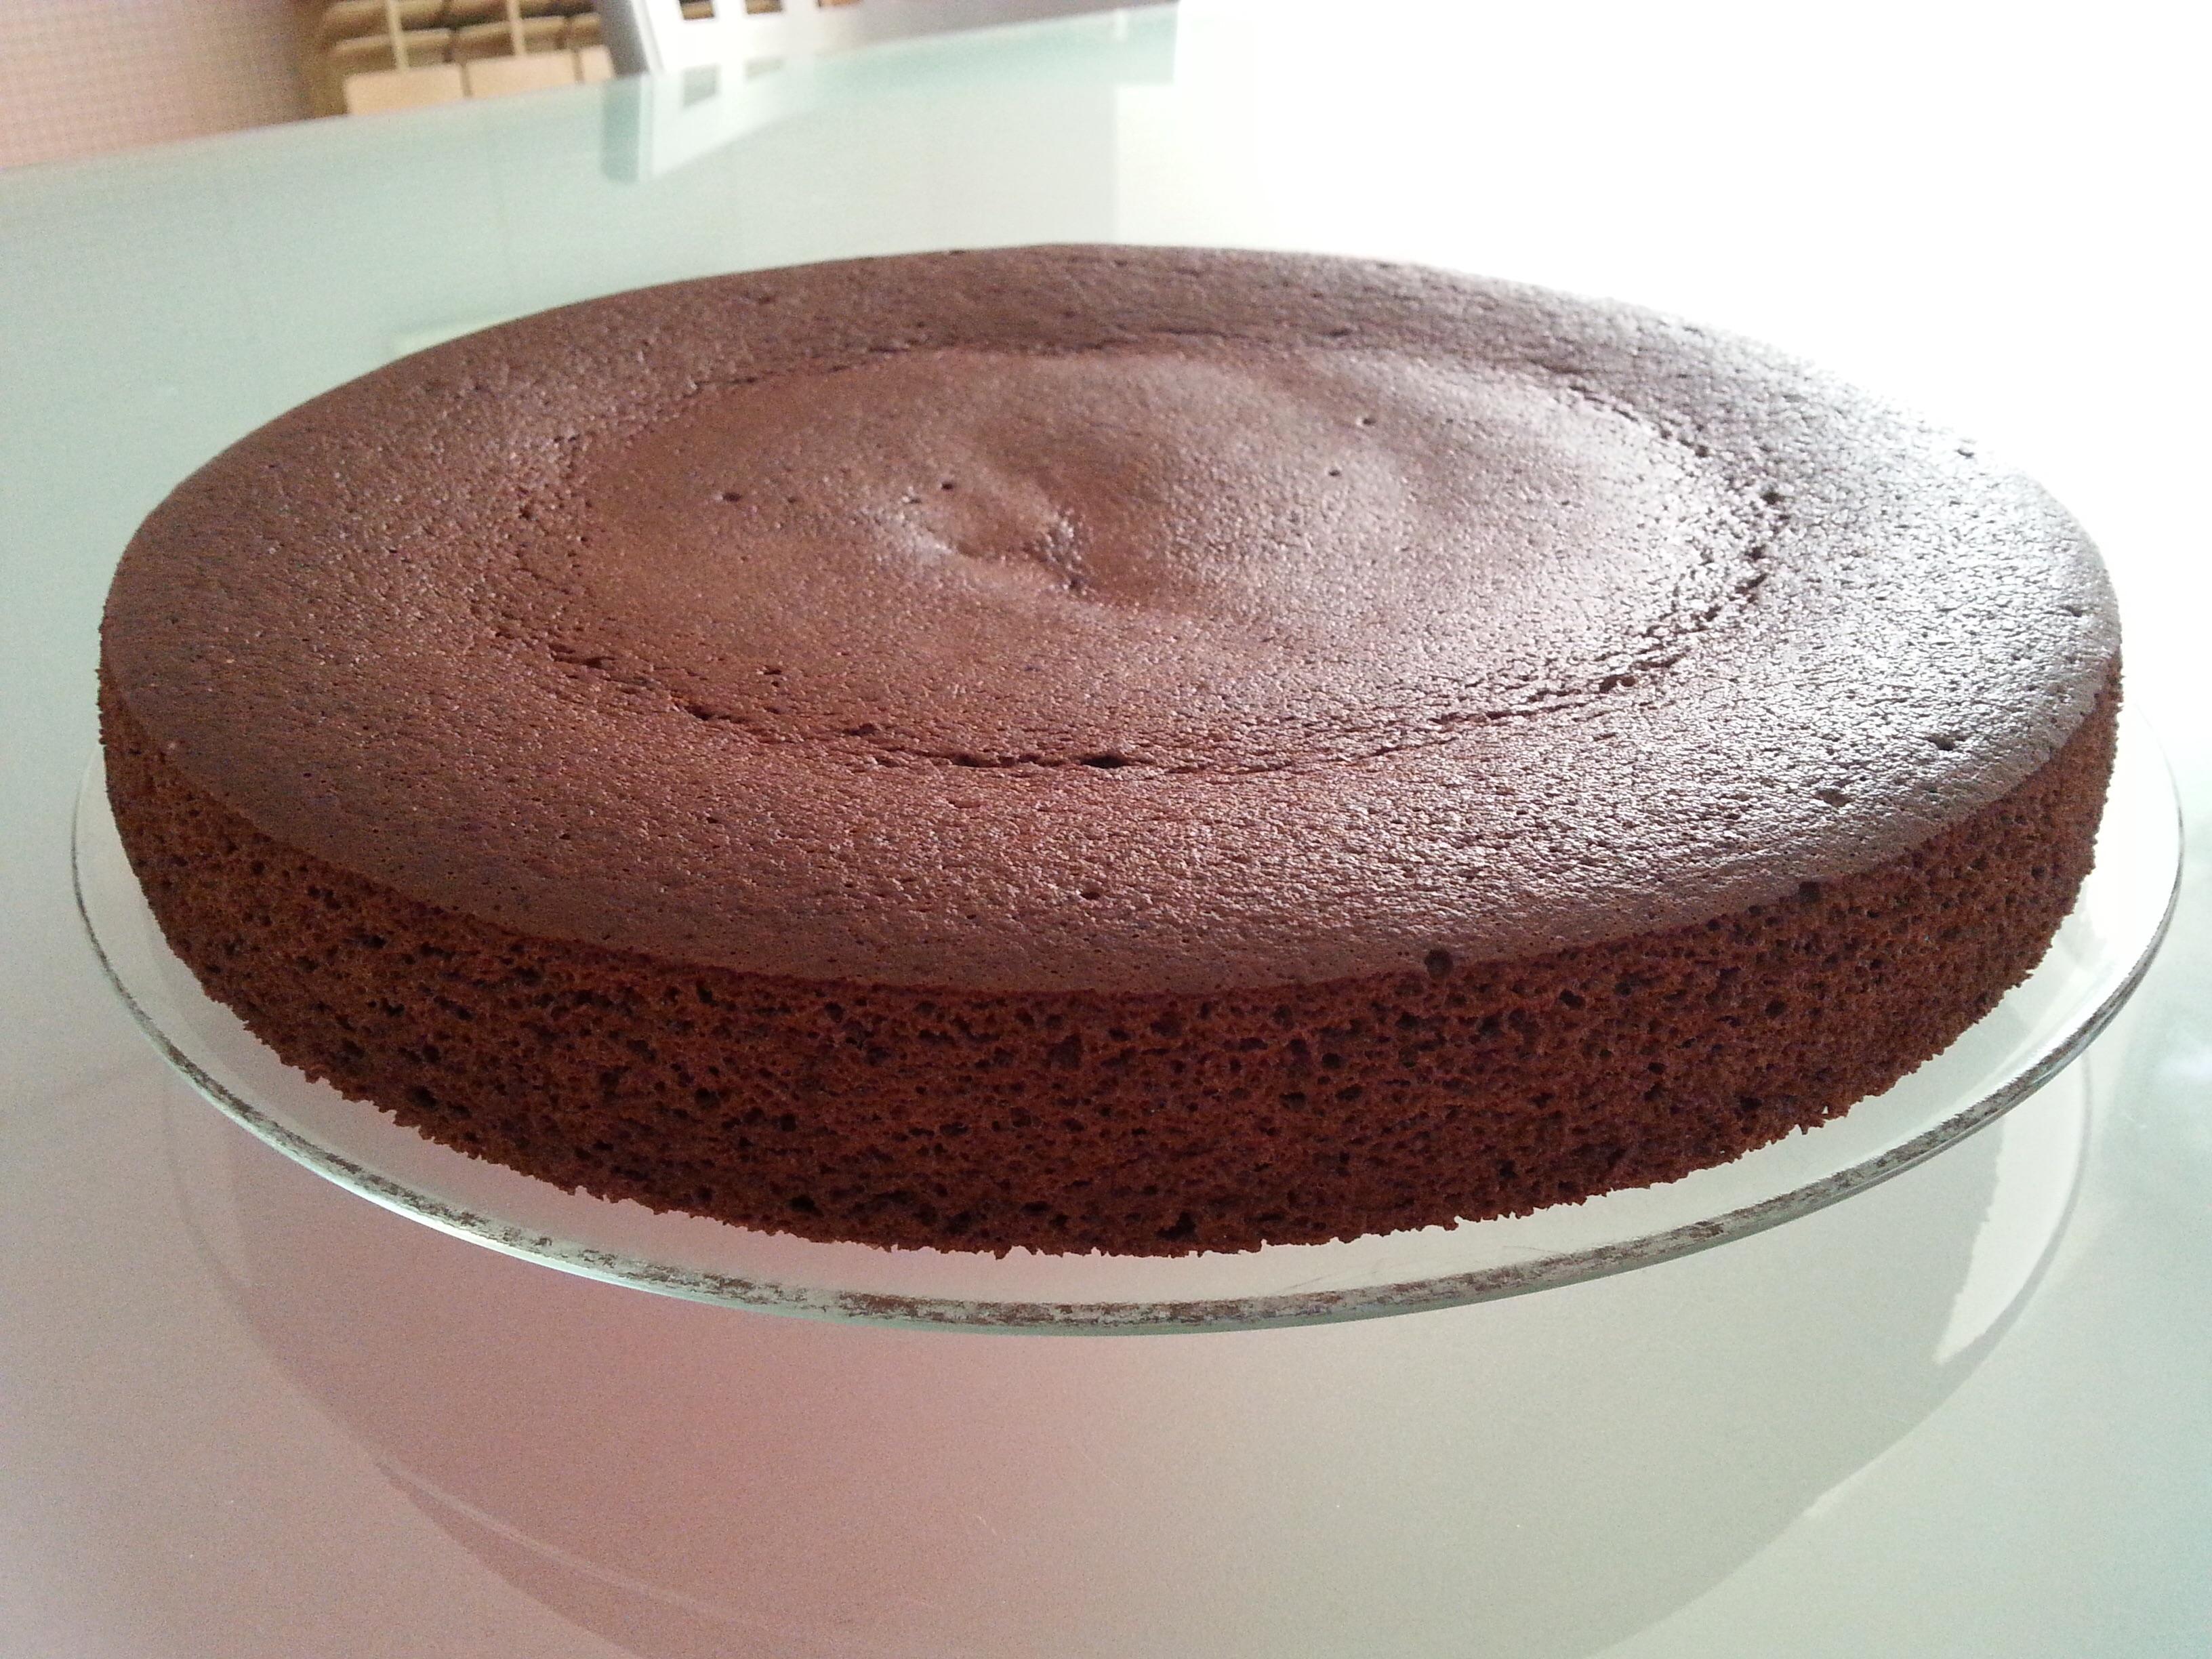 Torta Cacao Dukan.Dolci Archivi Pagina 2 Di 28 Cuciniamodukancuciniamodukan